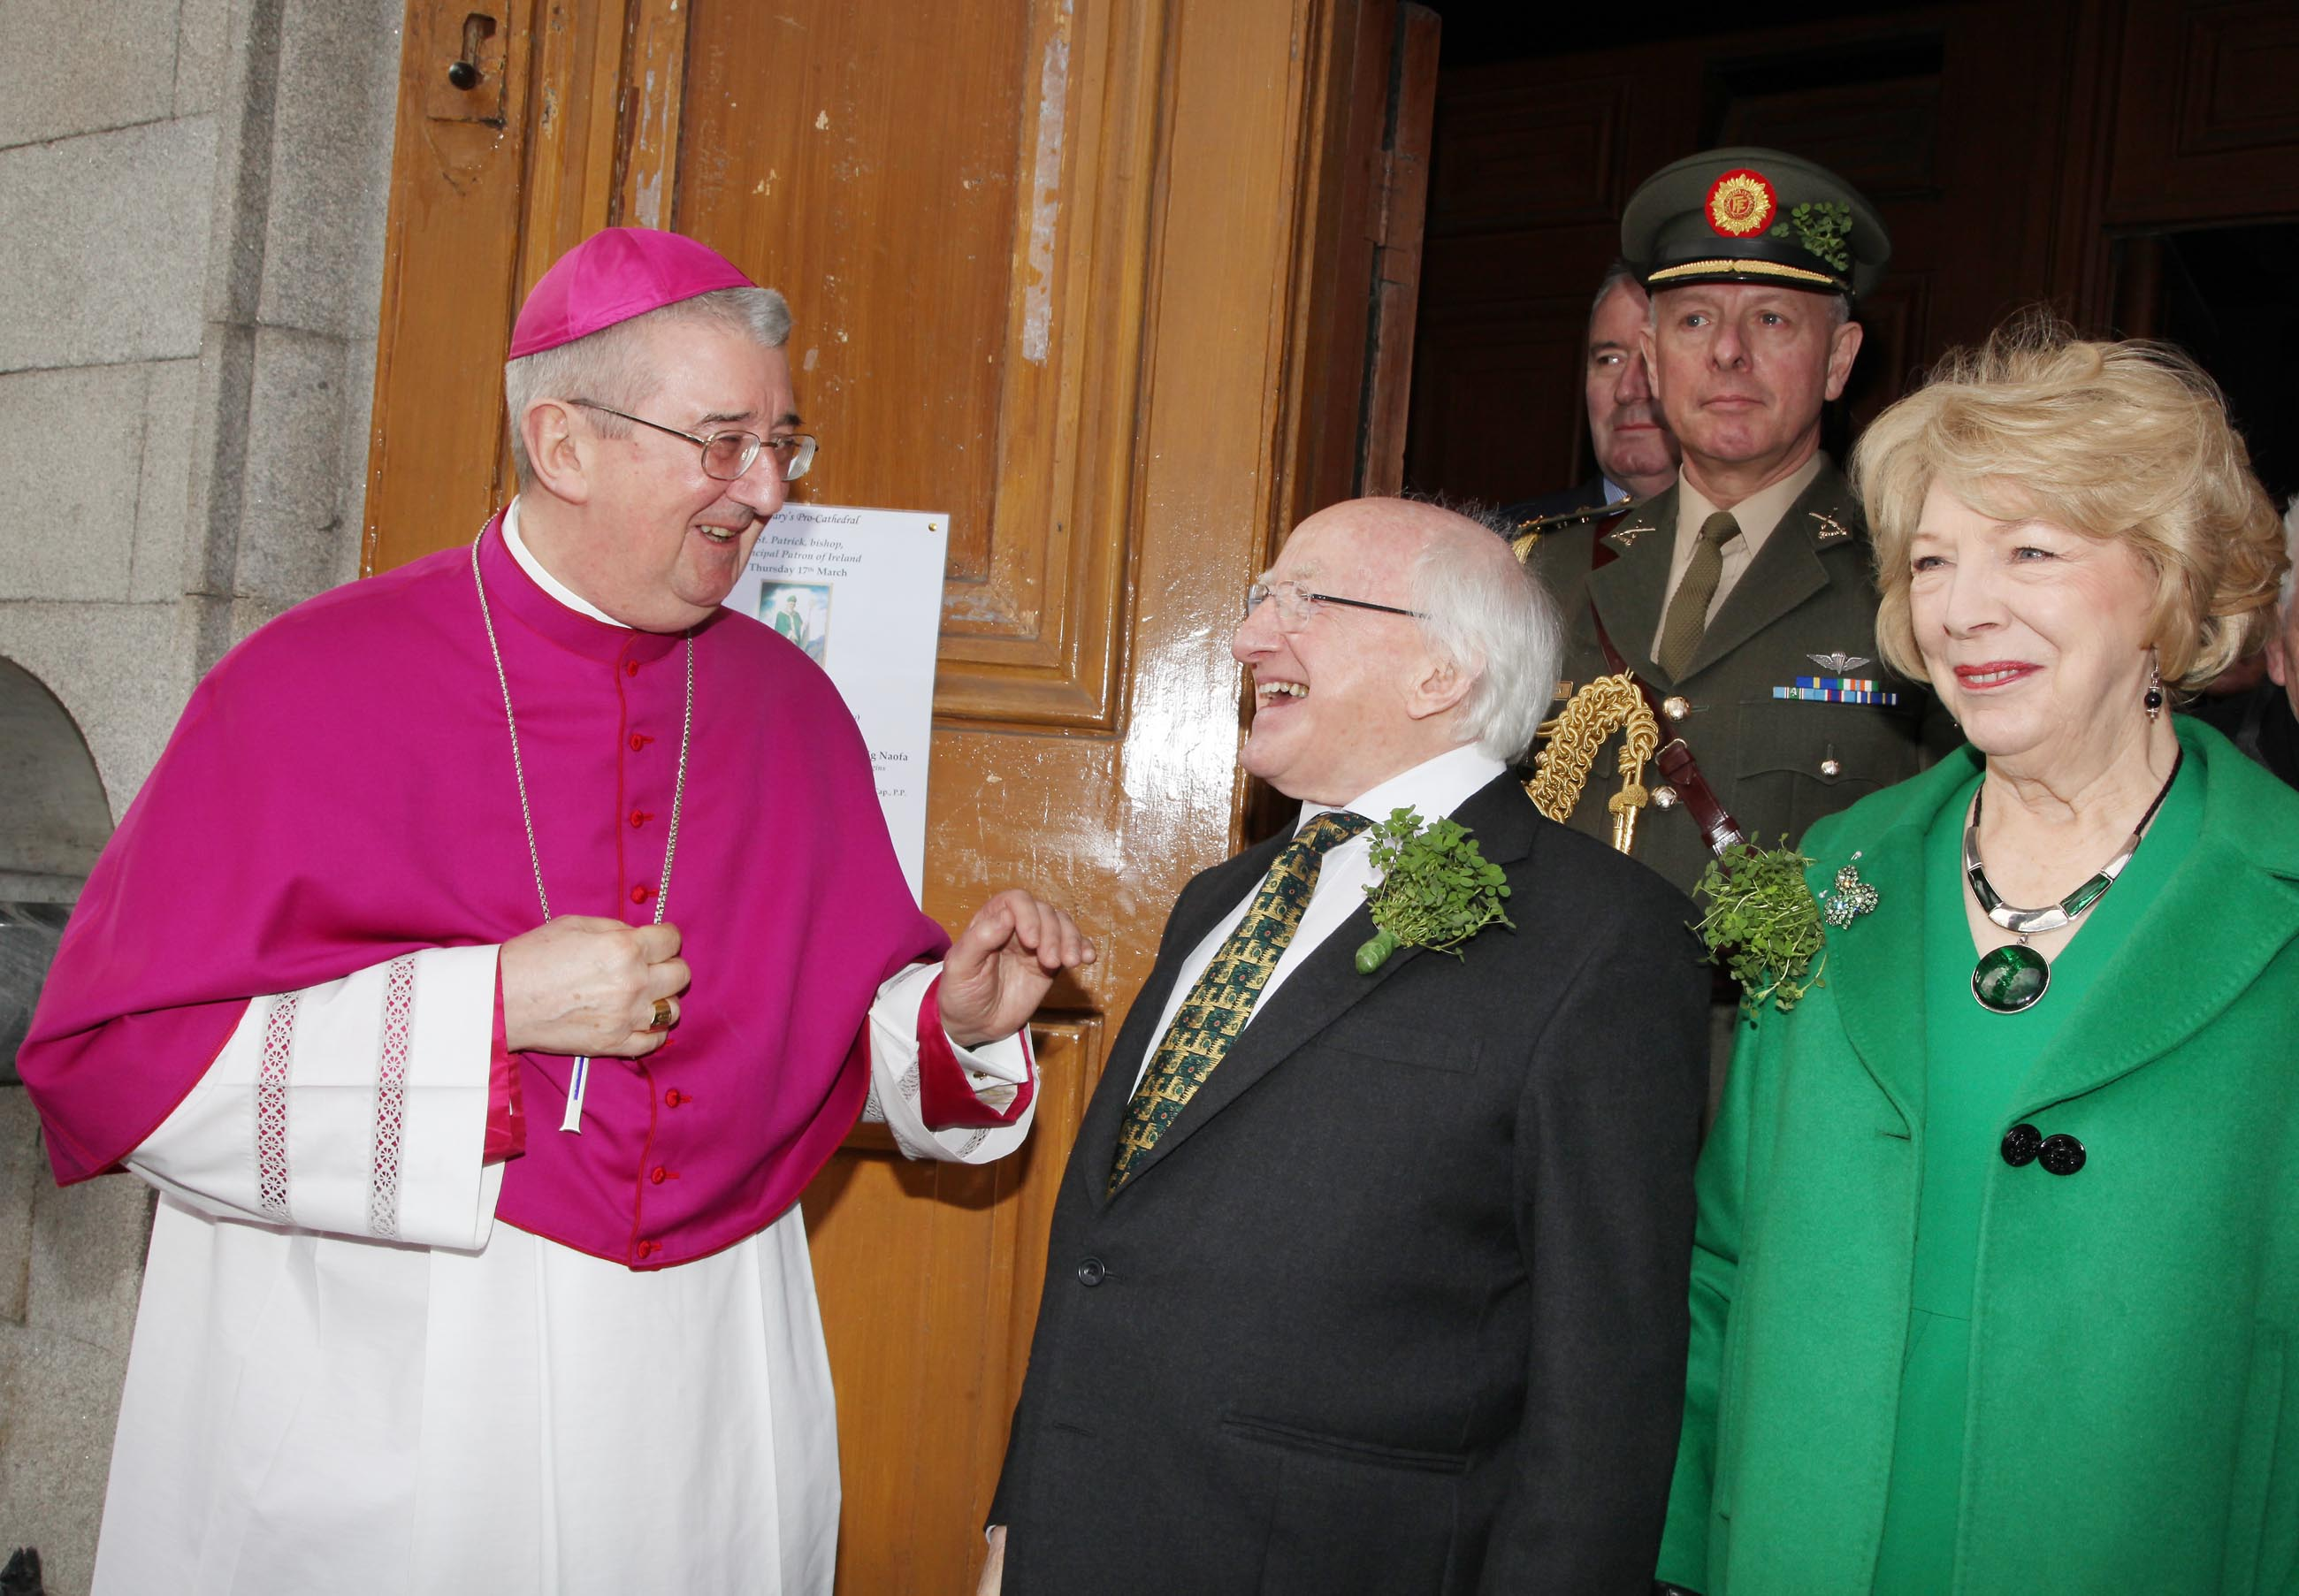 Fr Bryan Shorthall OFM Cap Archives - Catholicireland